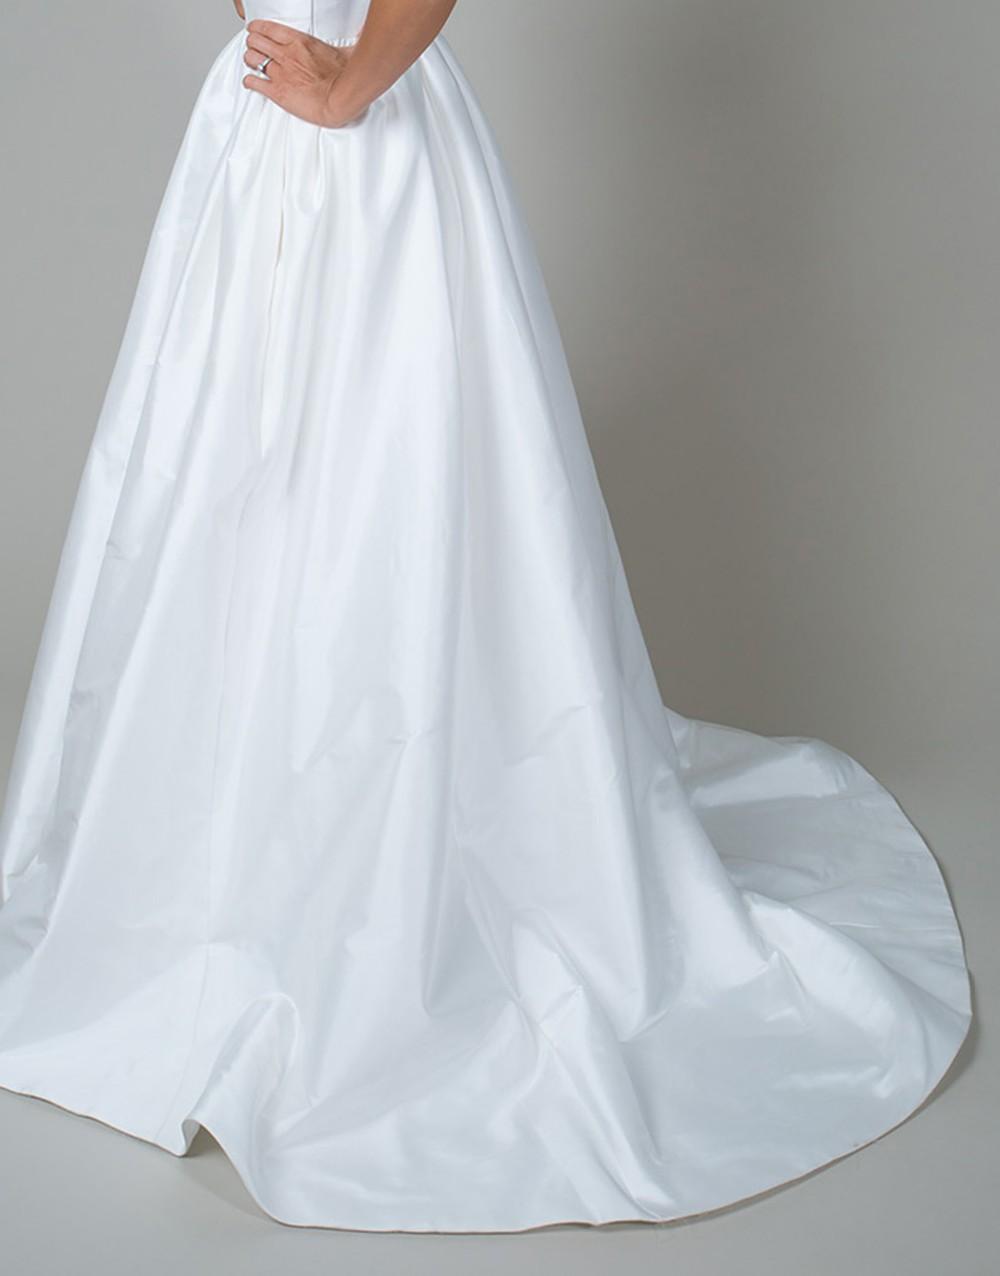 Vintage long white summer boho beach wedding dress with pockets 2015 v neck see through bridal gowns vestidos de noiva UD-442 6